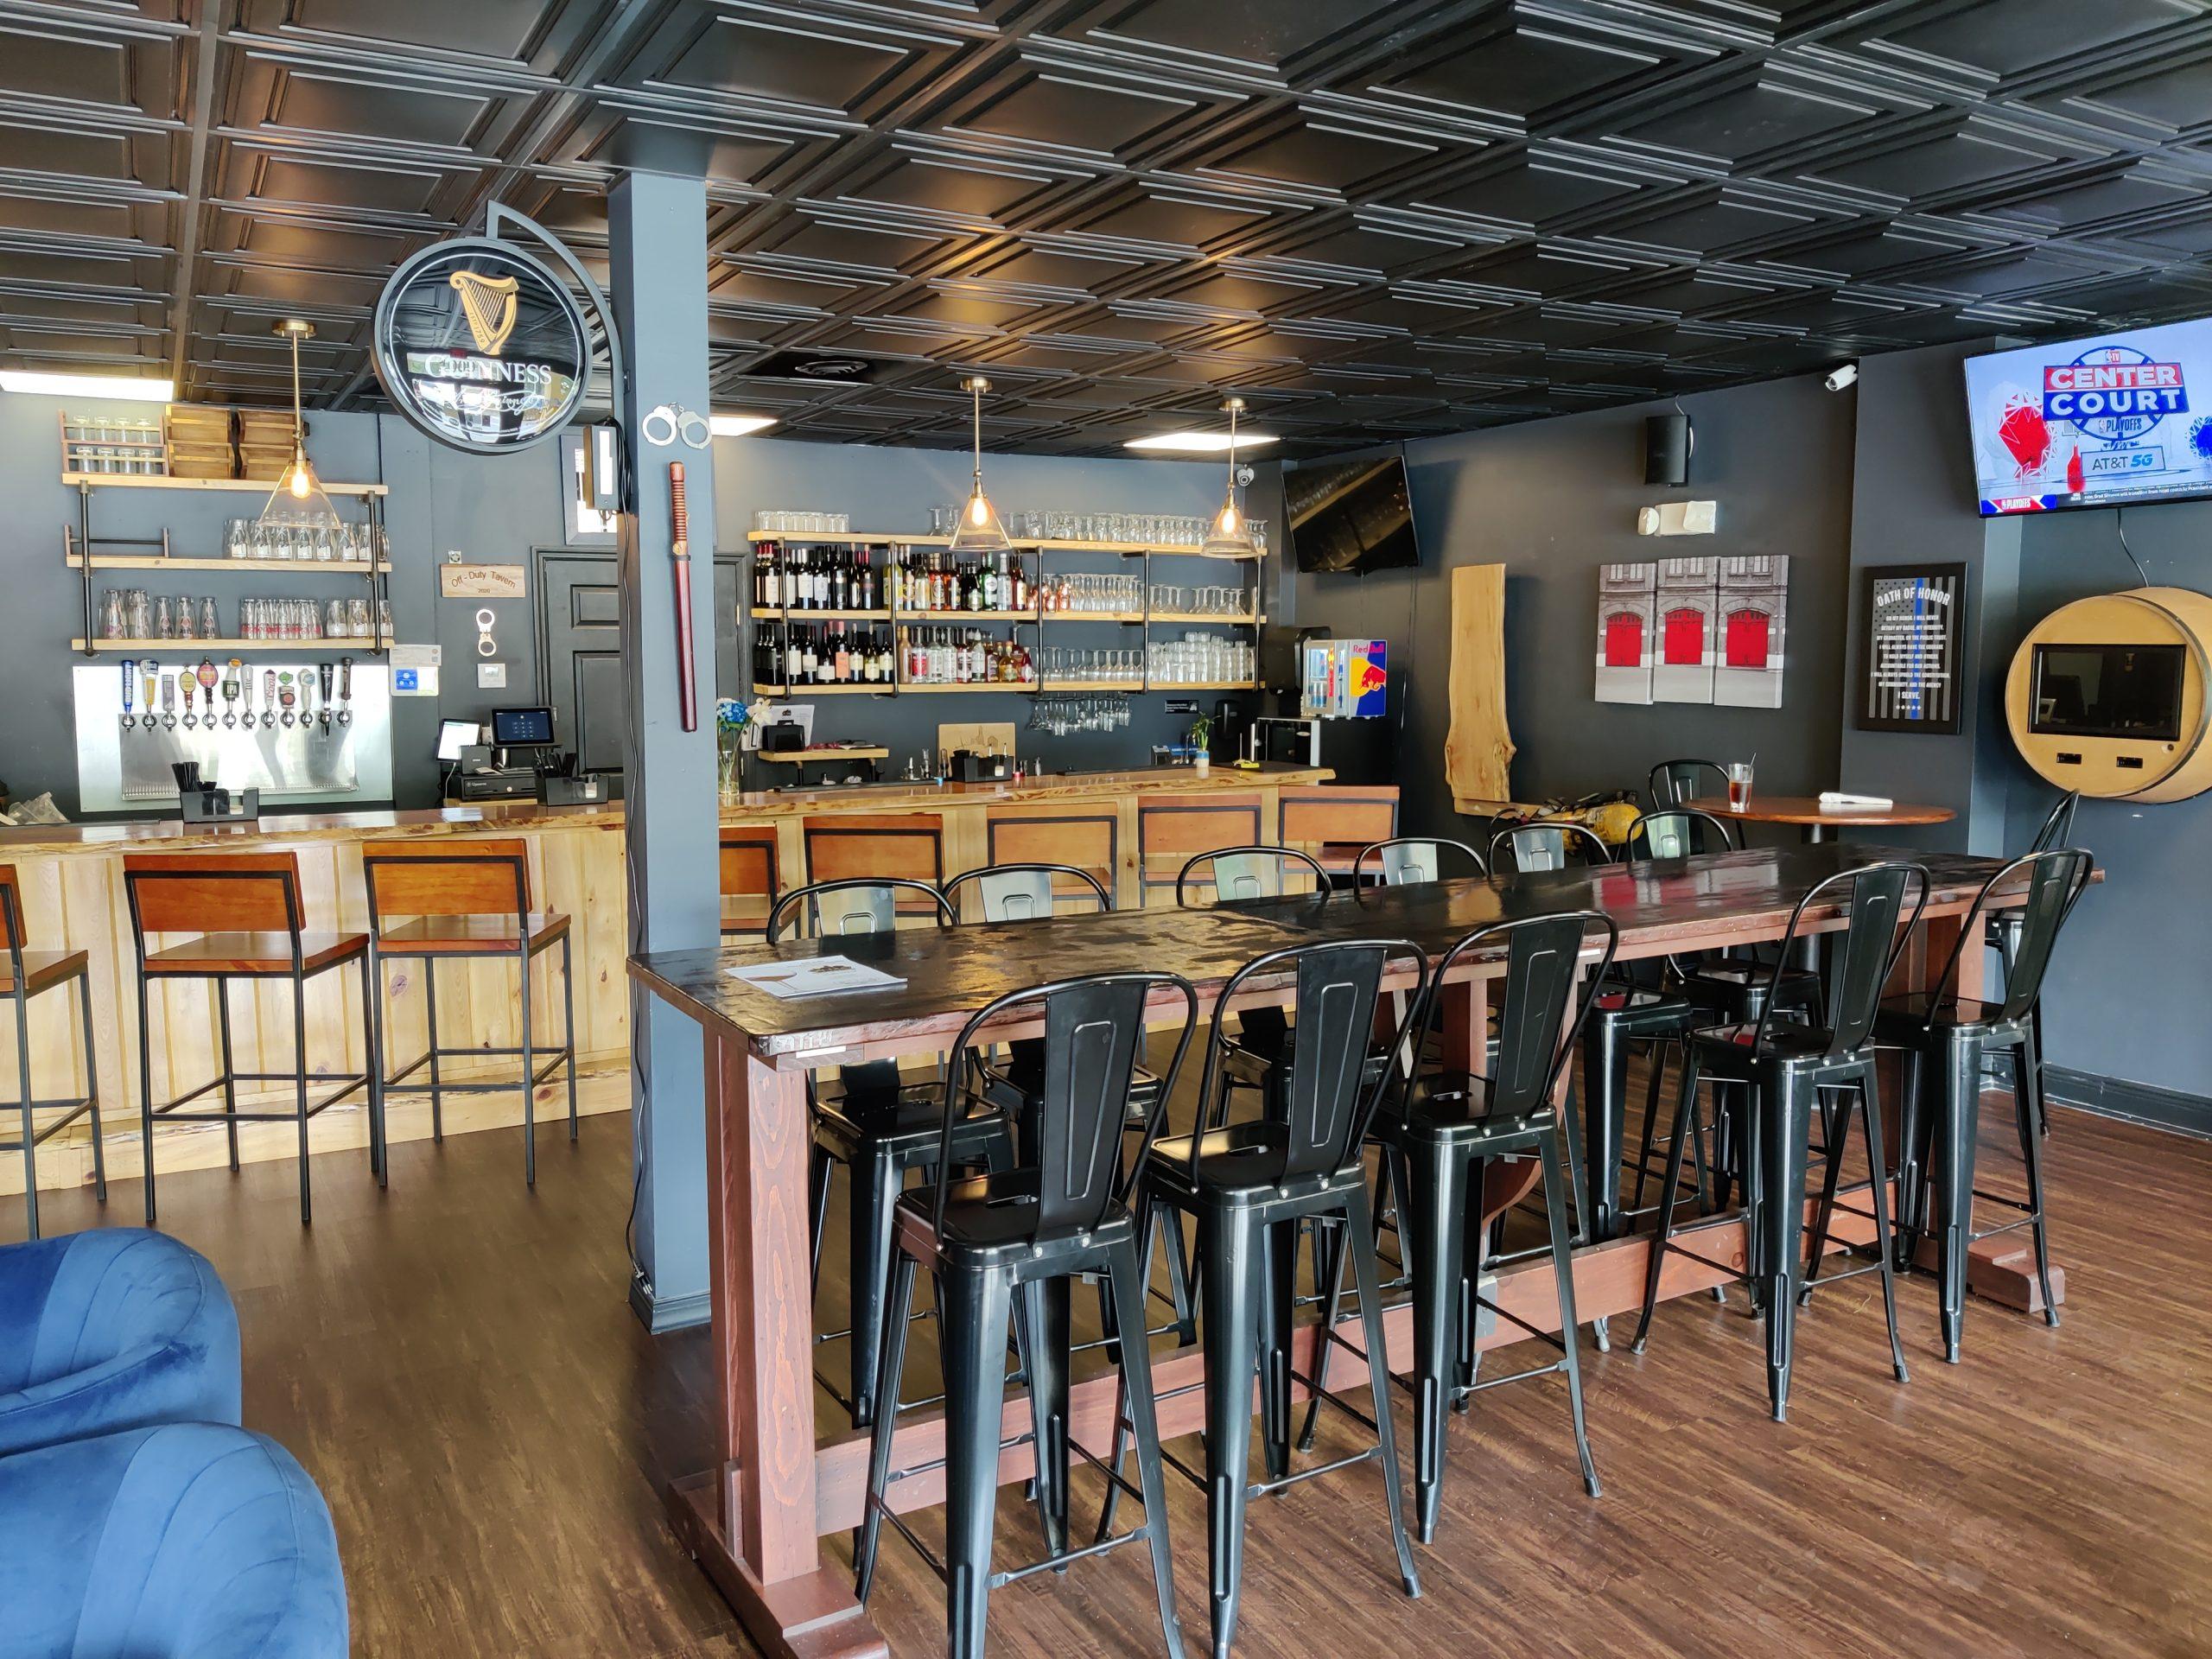 06-03-2021 Off-Duty Tavern - inside